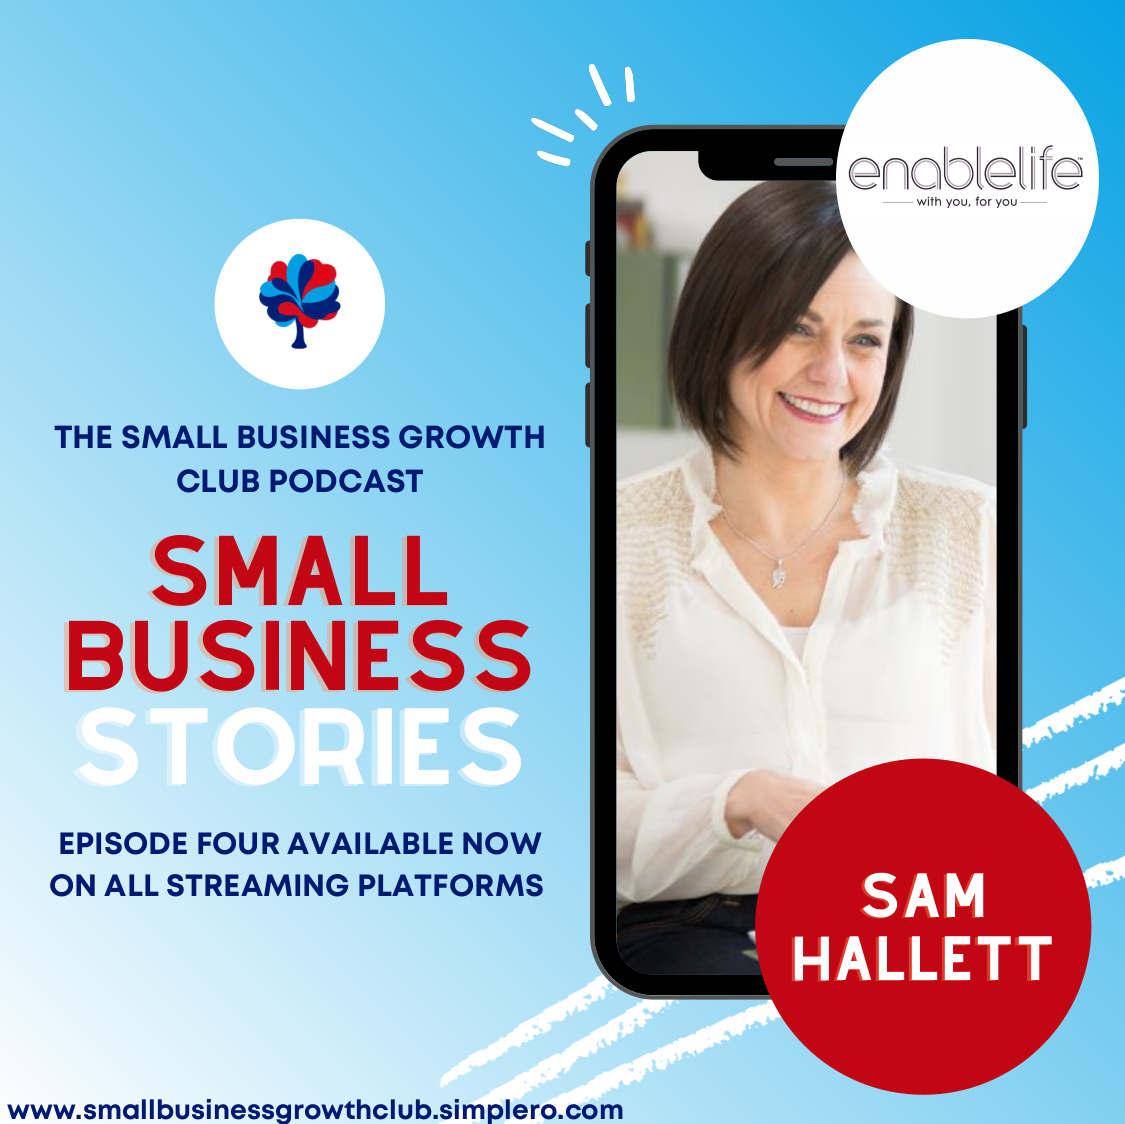 Sam Hallett - Small Business Stories